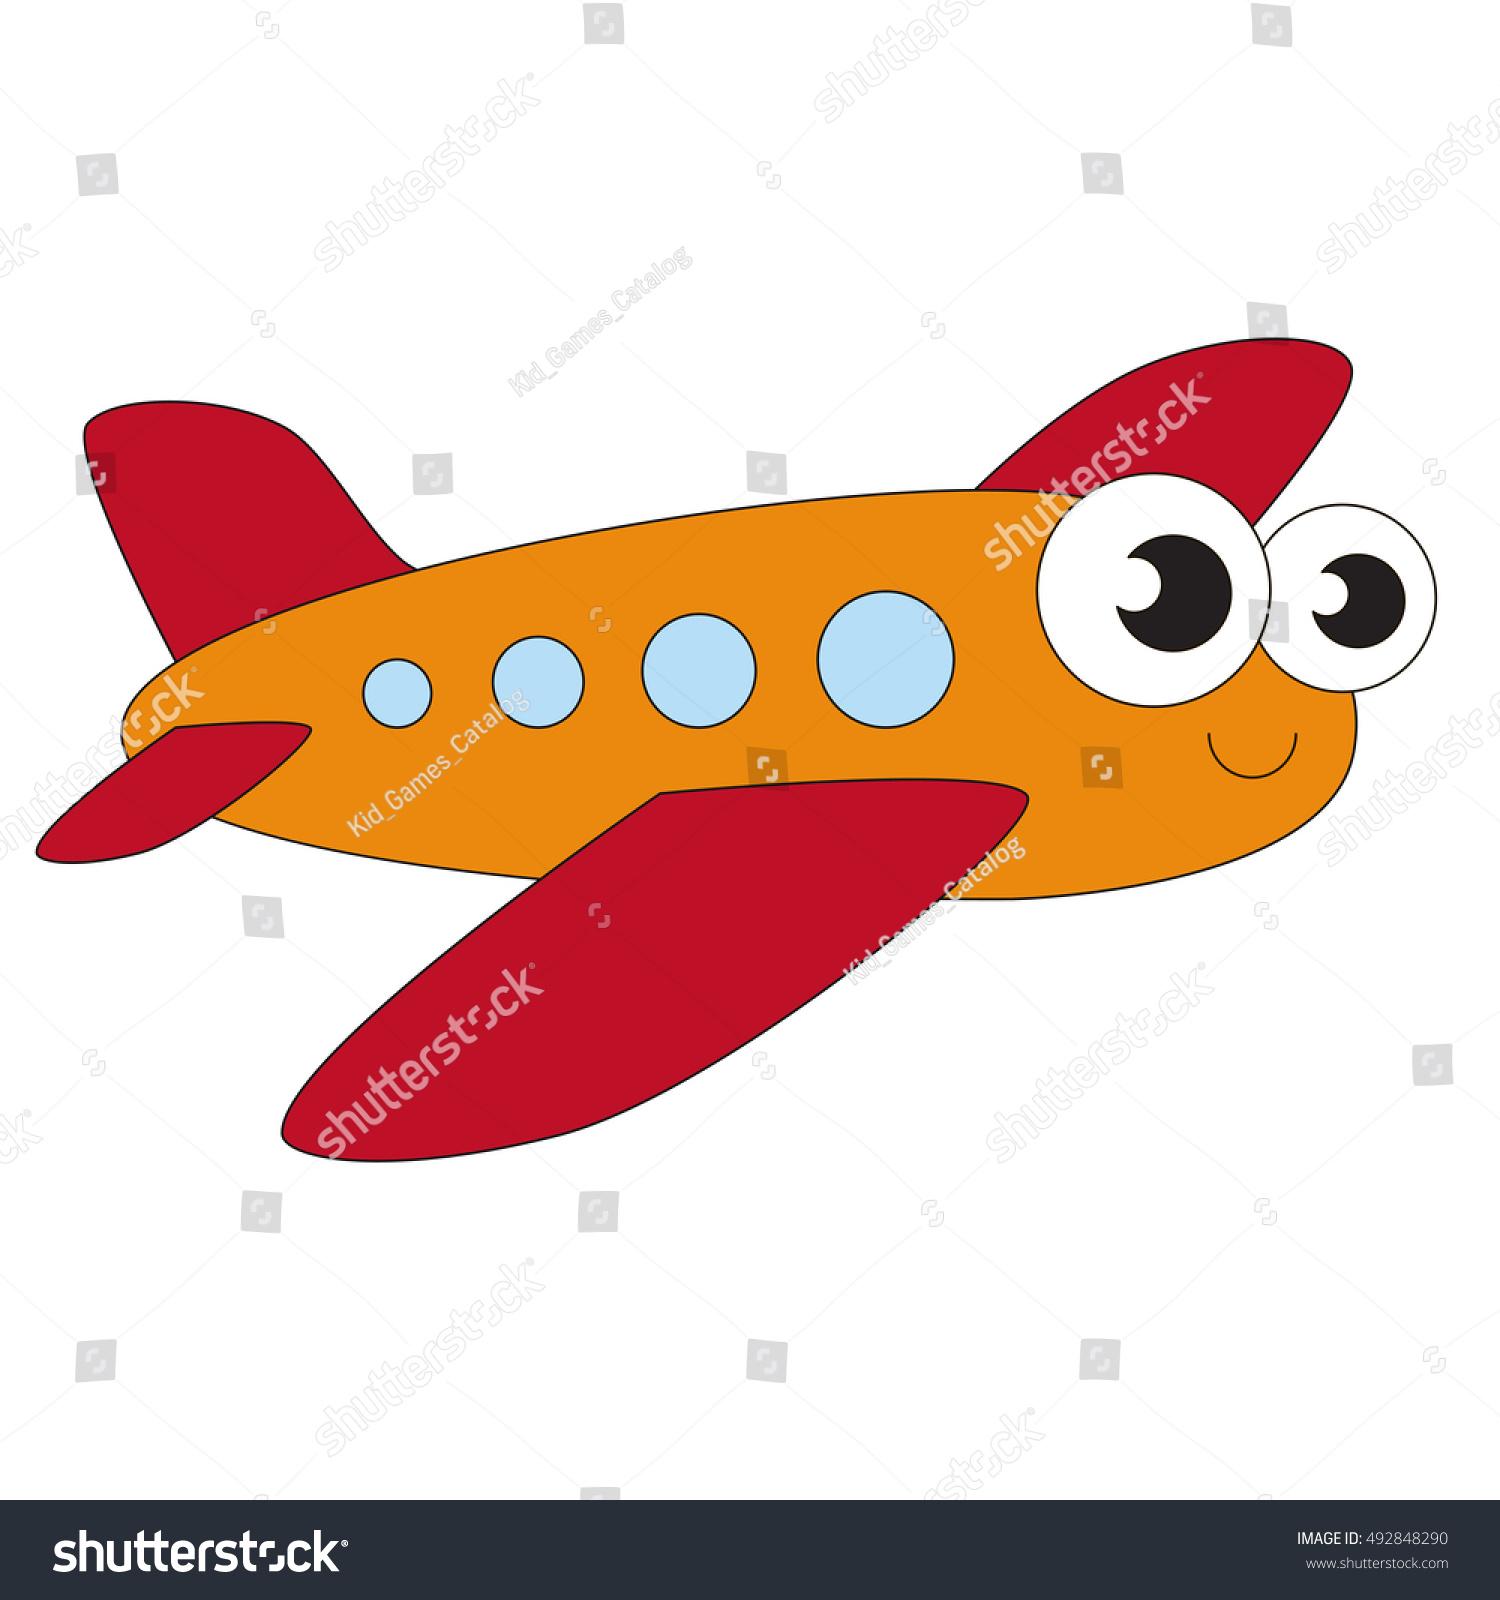 Orange Plane Cartoon Outlined Flying Vehicle Stock Vector 492848290 ...